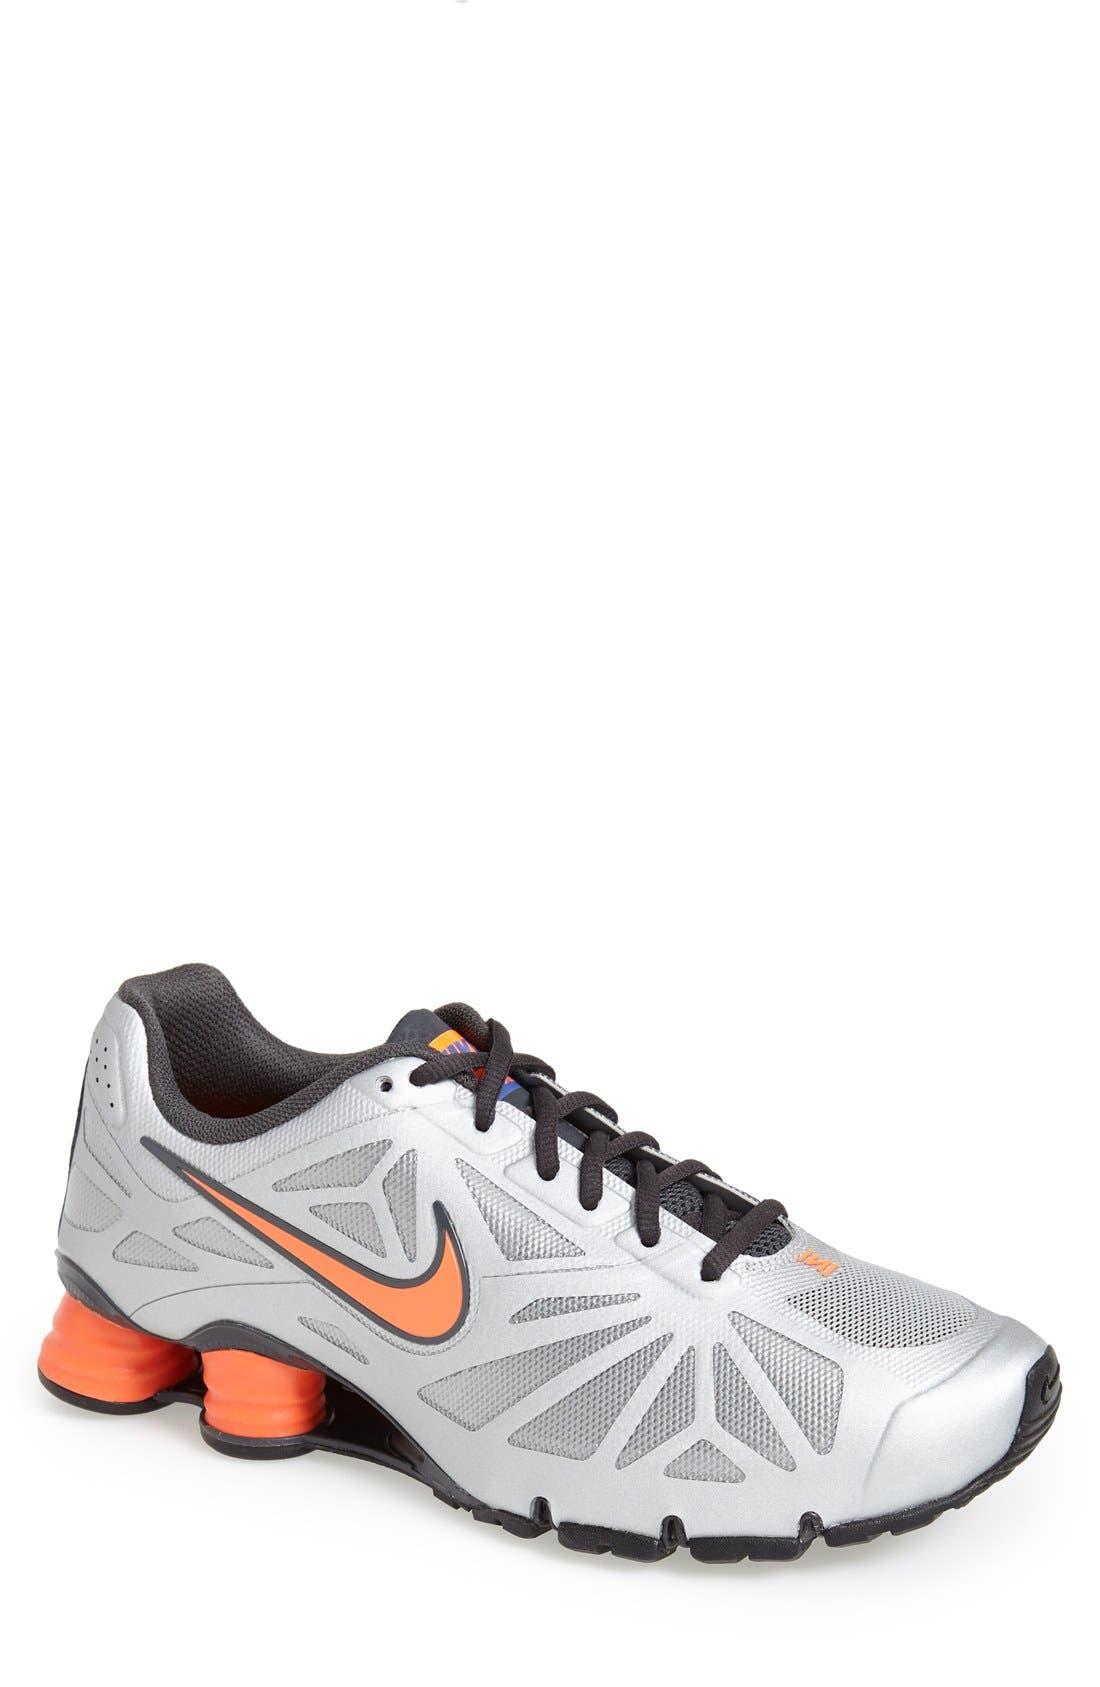 Alternate Image 1 Selected - Nike 'Shox Turbo 14' Running Shoe (Men)